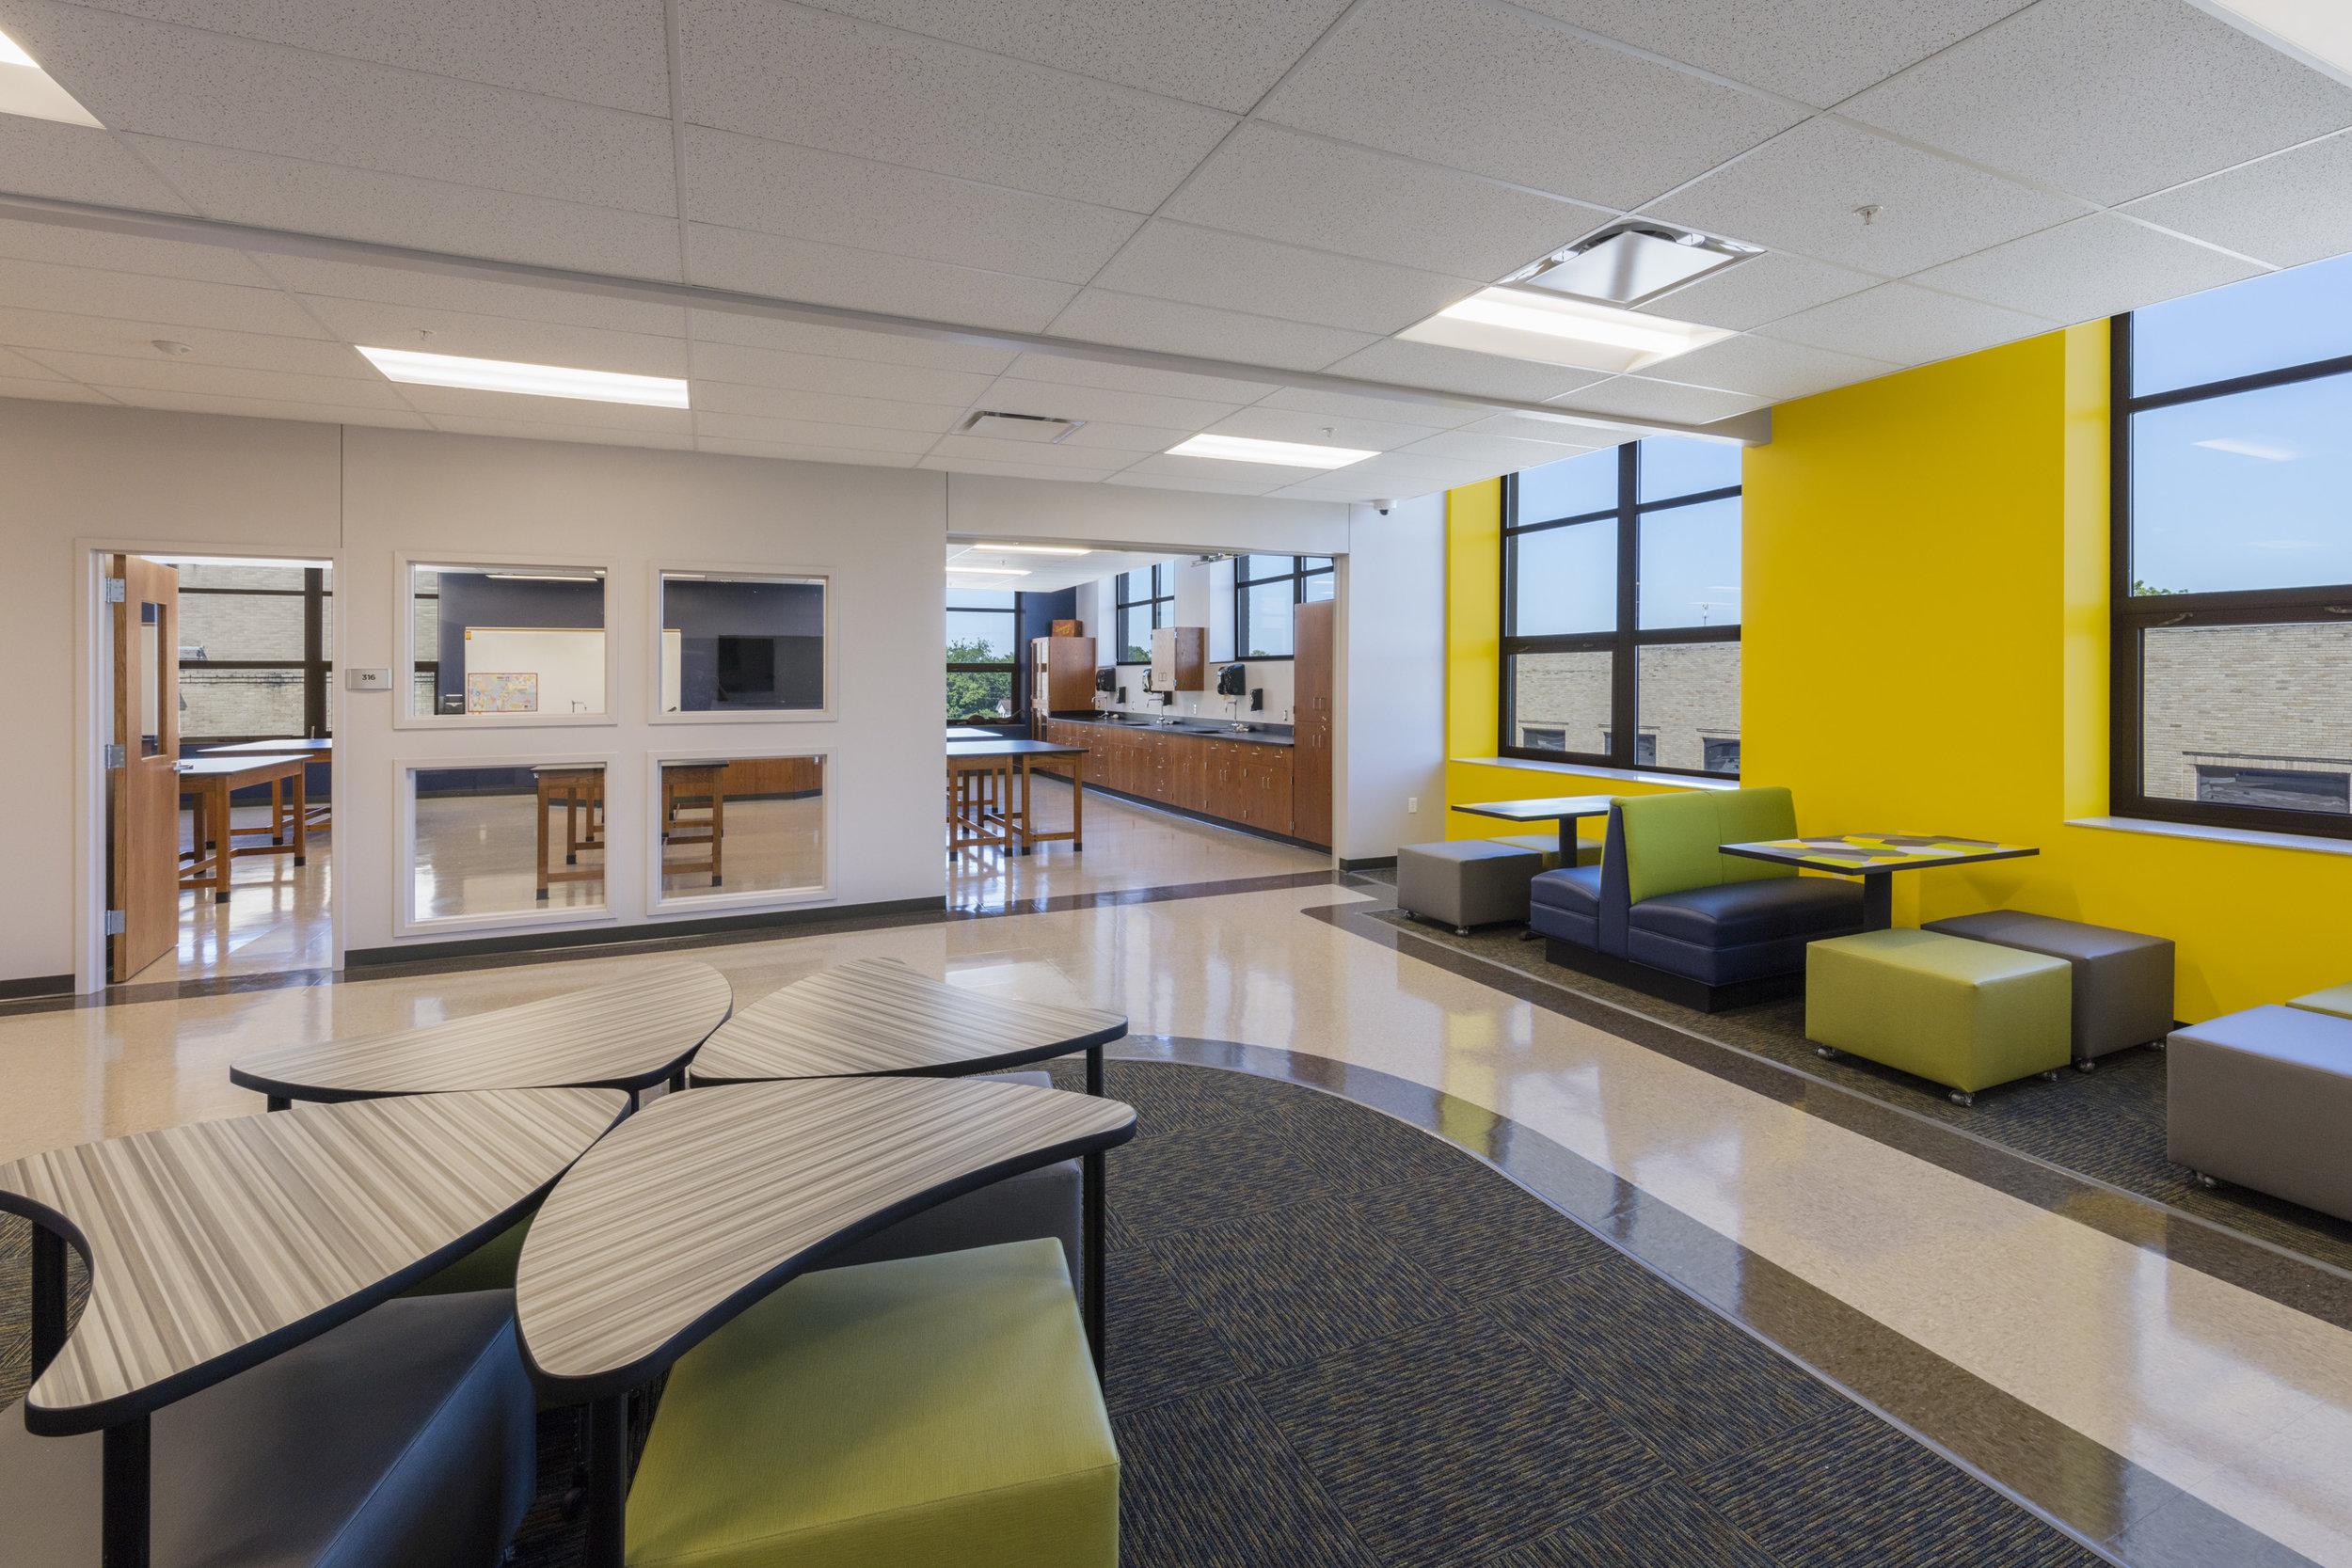 GISA Interior 3rd Floor Open Learning Area.jpg